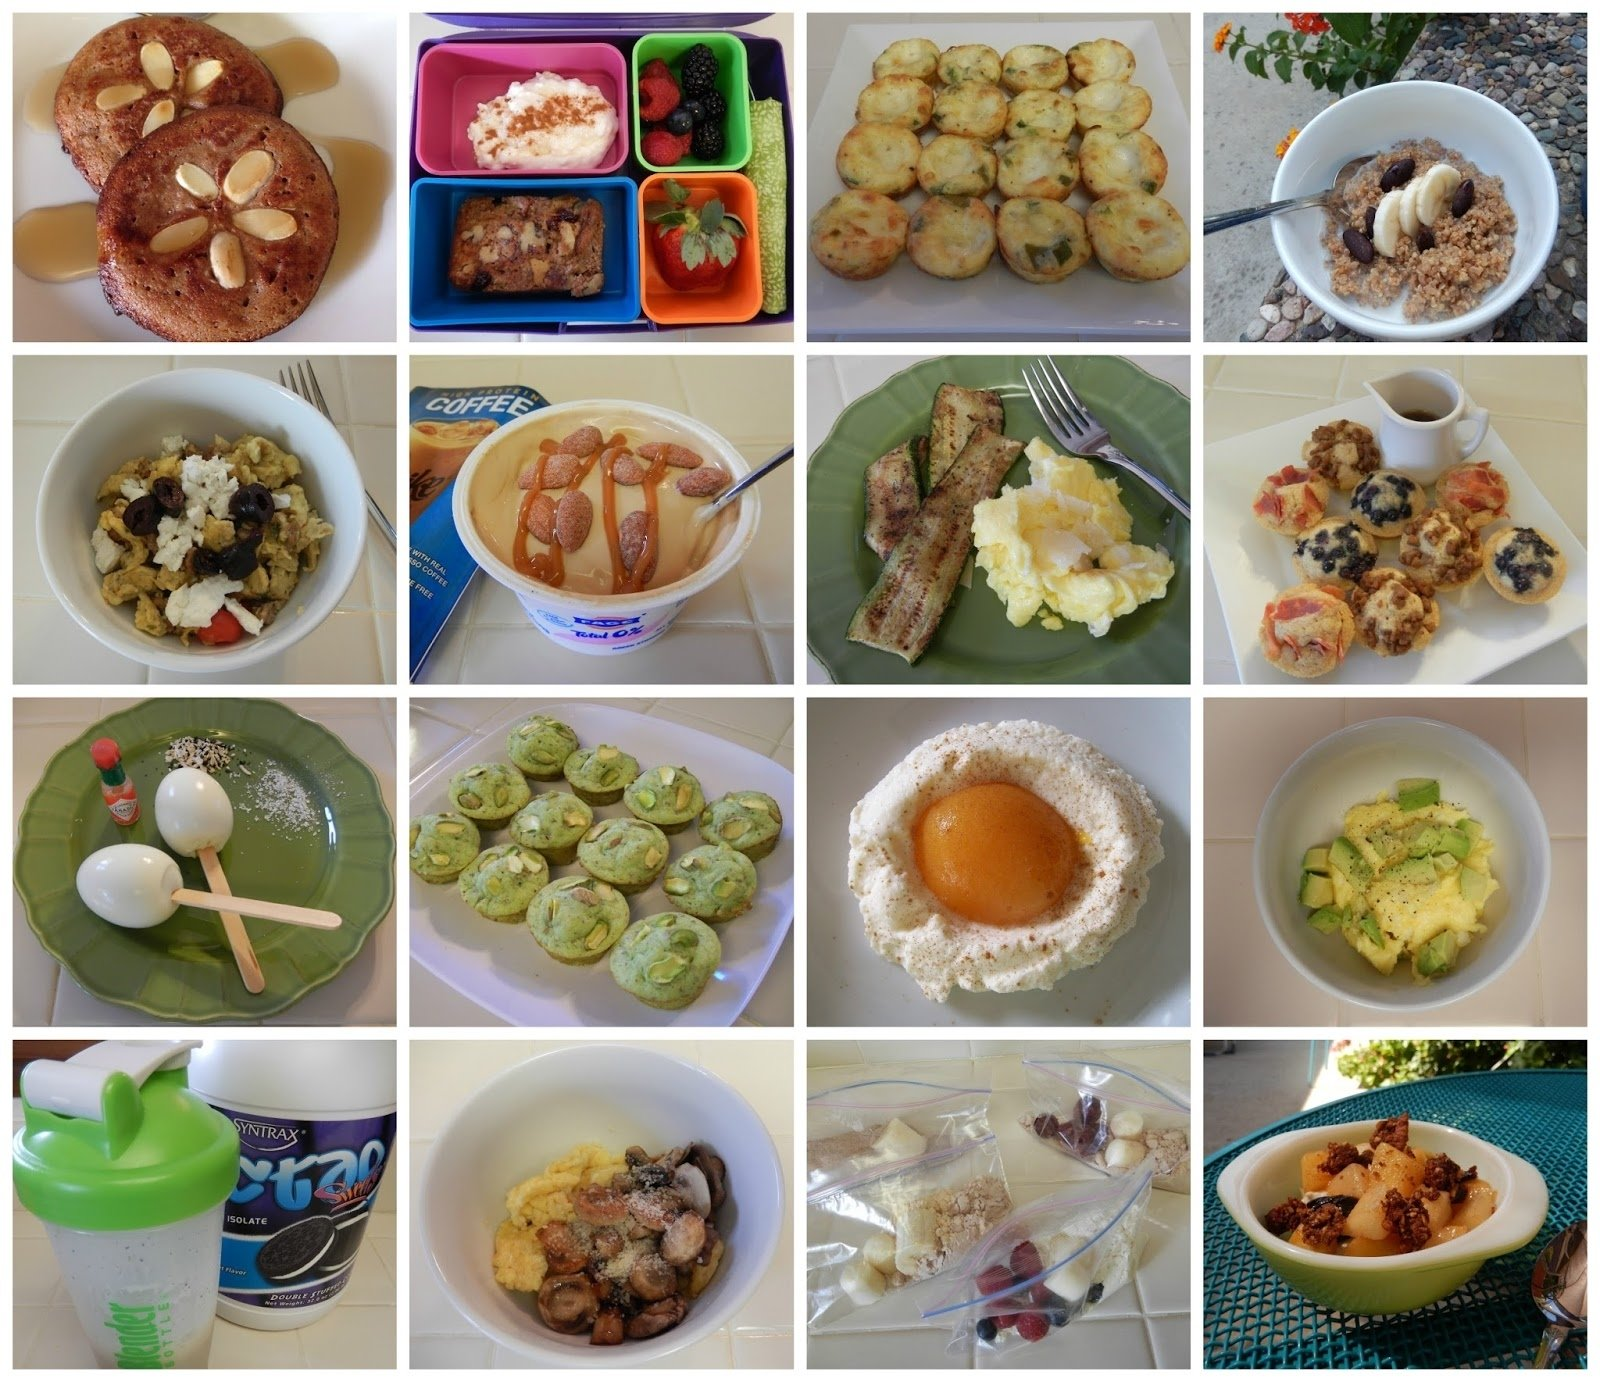 10 Wonderful Healthy Breakfast Ideas To Lose Weight weight loss recipes oodles of healthy breakfast ideas weight loss zone 2